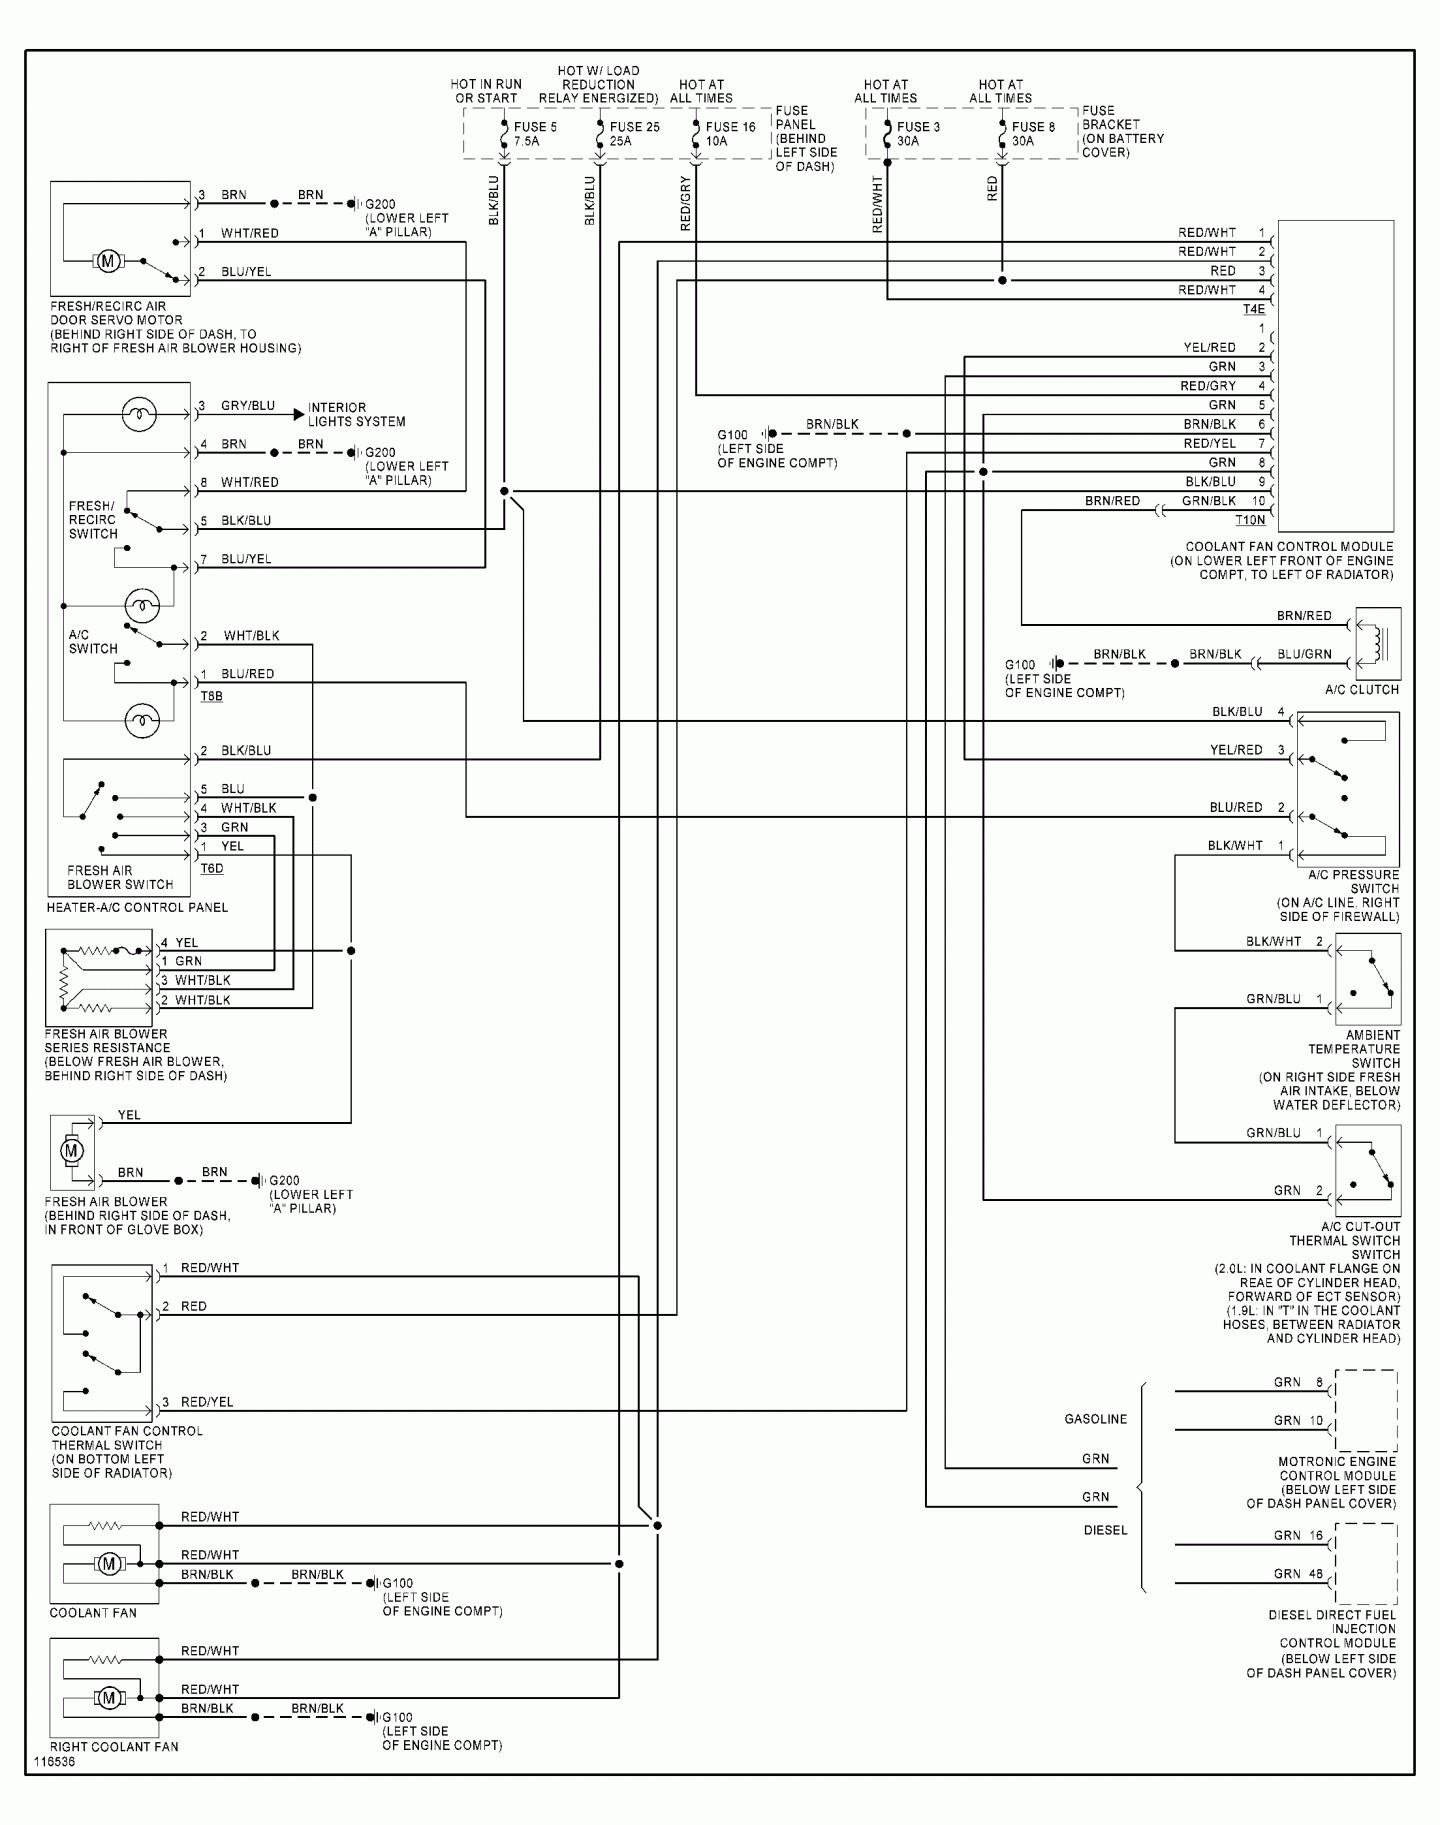 Vw Passat Wiring Diagram Inspirational Radio Wiring Diagram Diagram Of Vw Passat Wiring Diagram